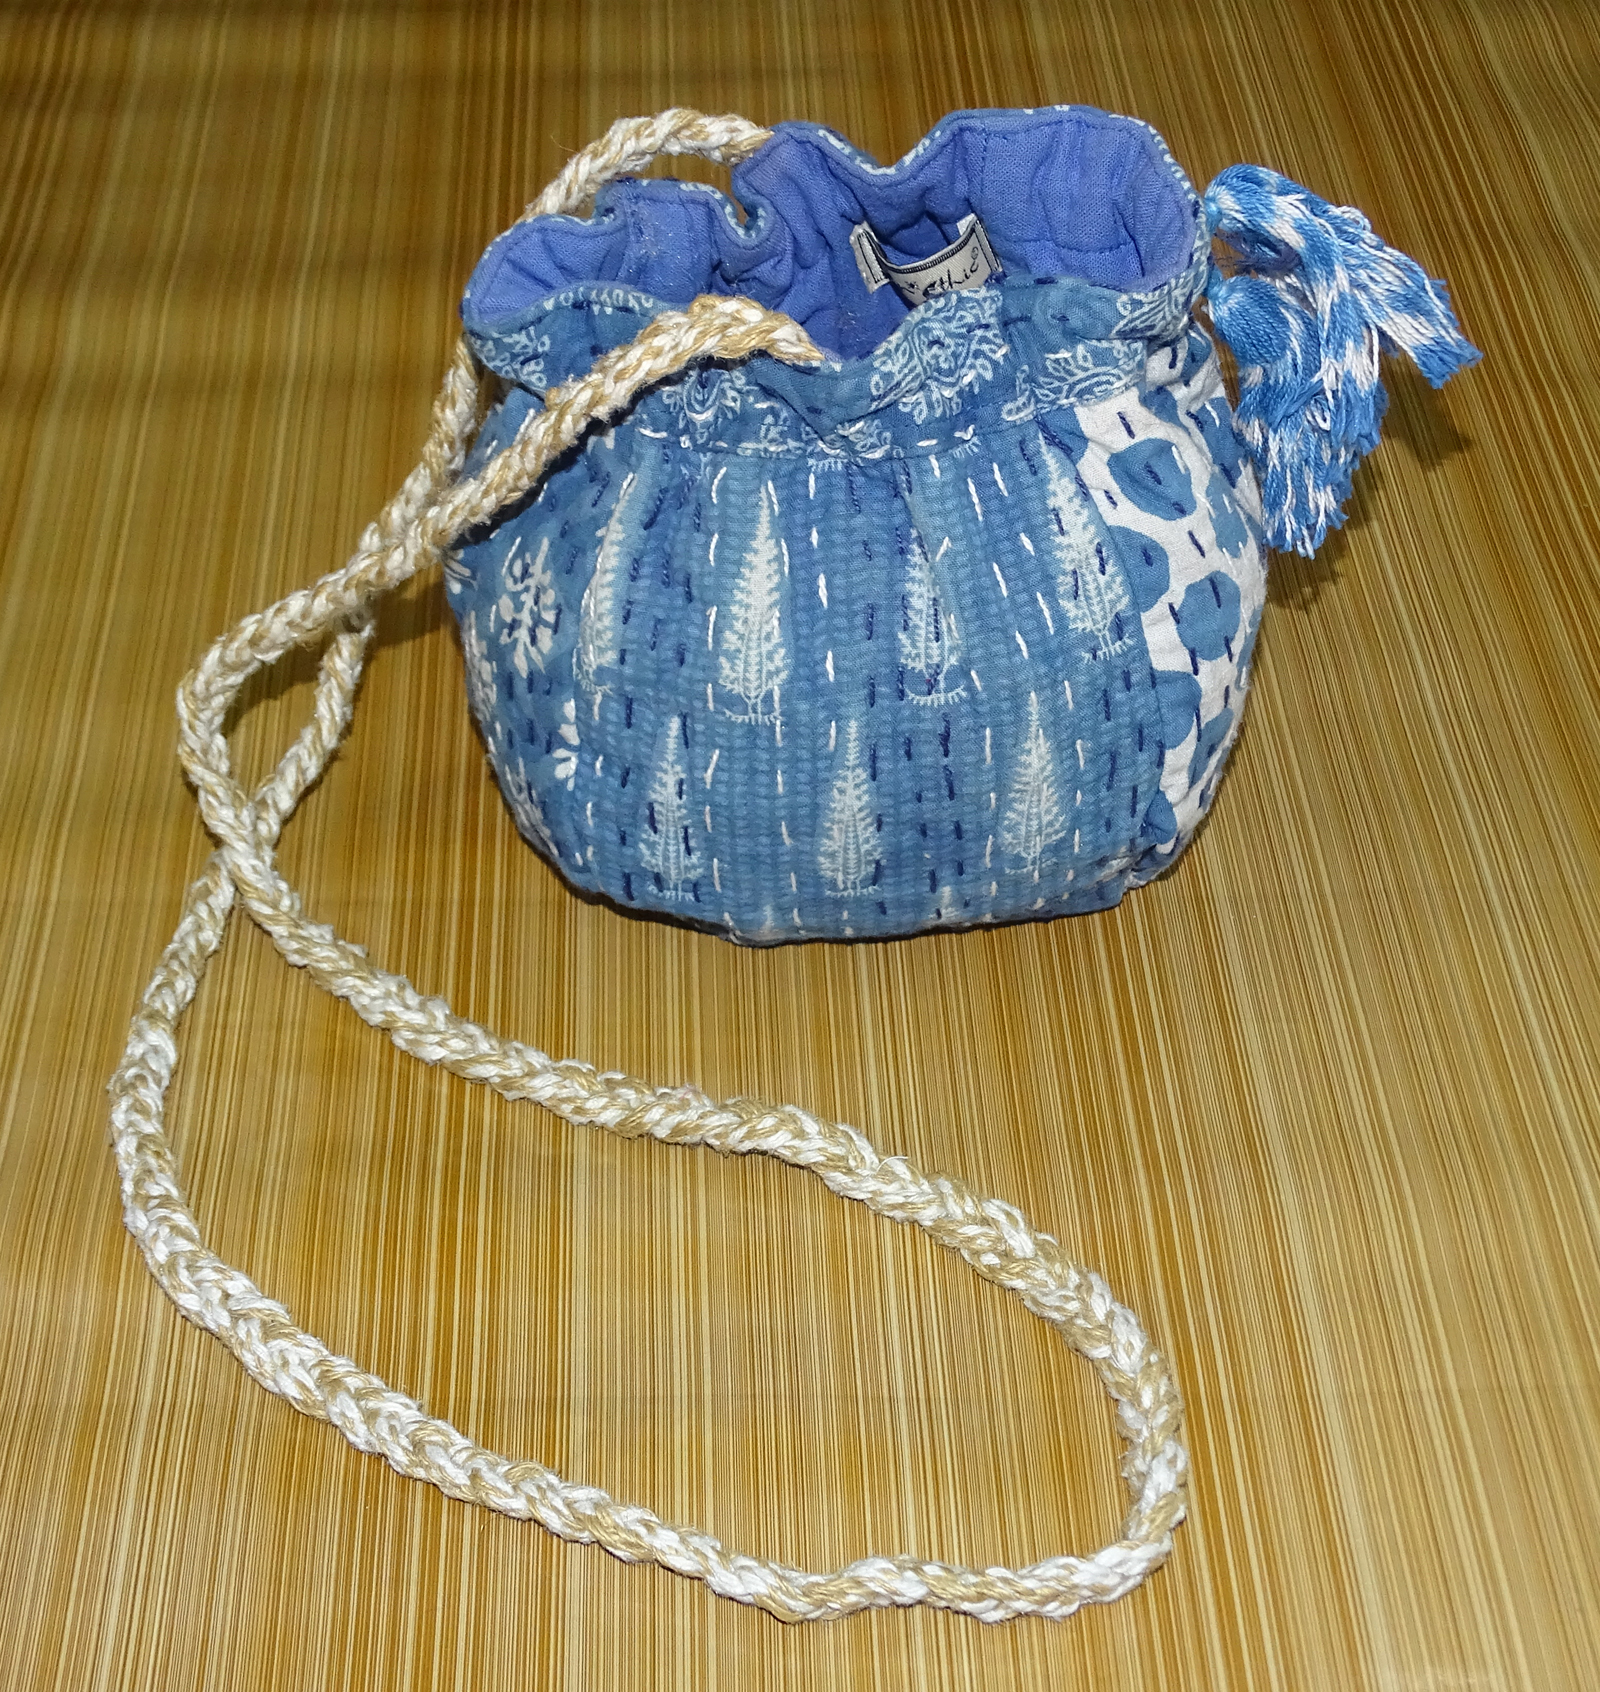 Indigo Handmade Pouches